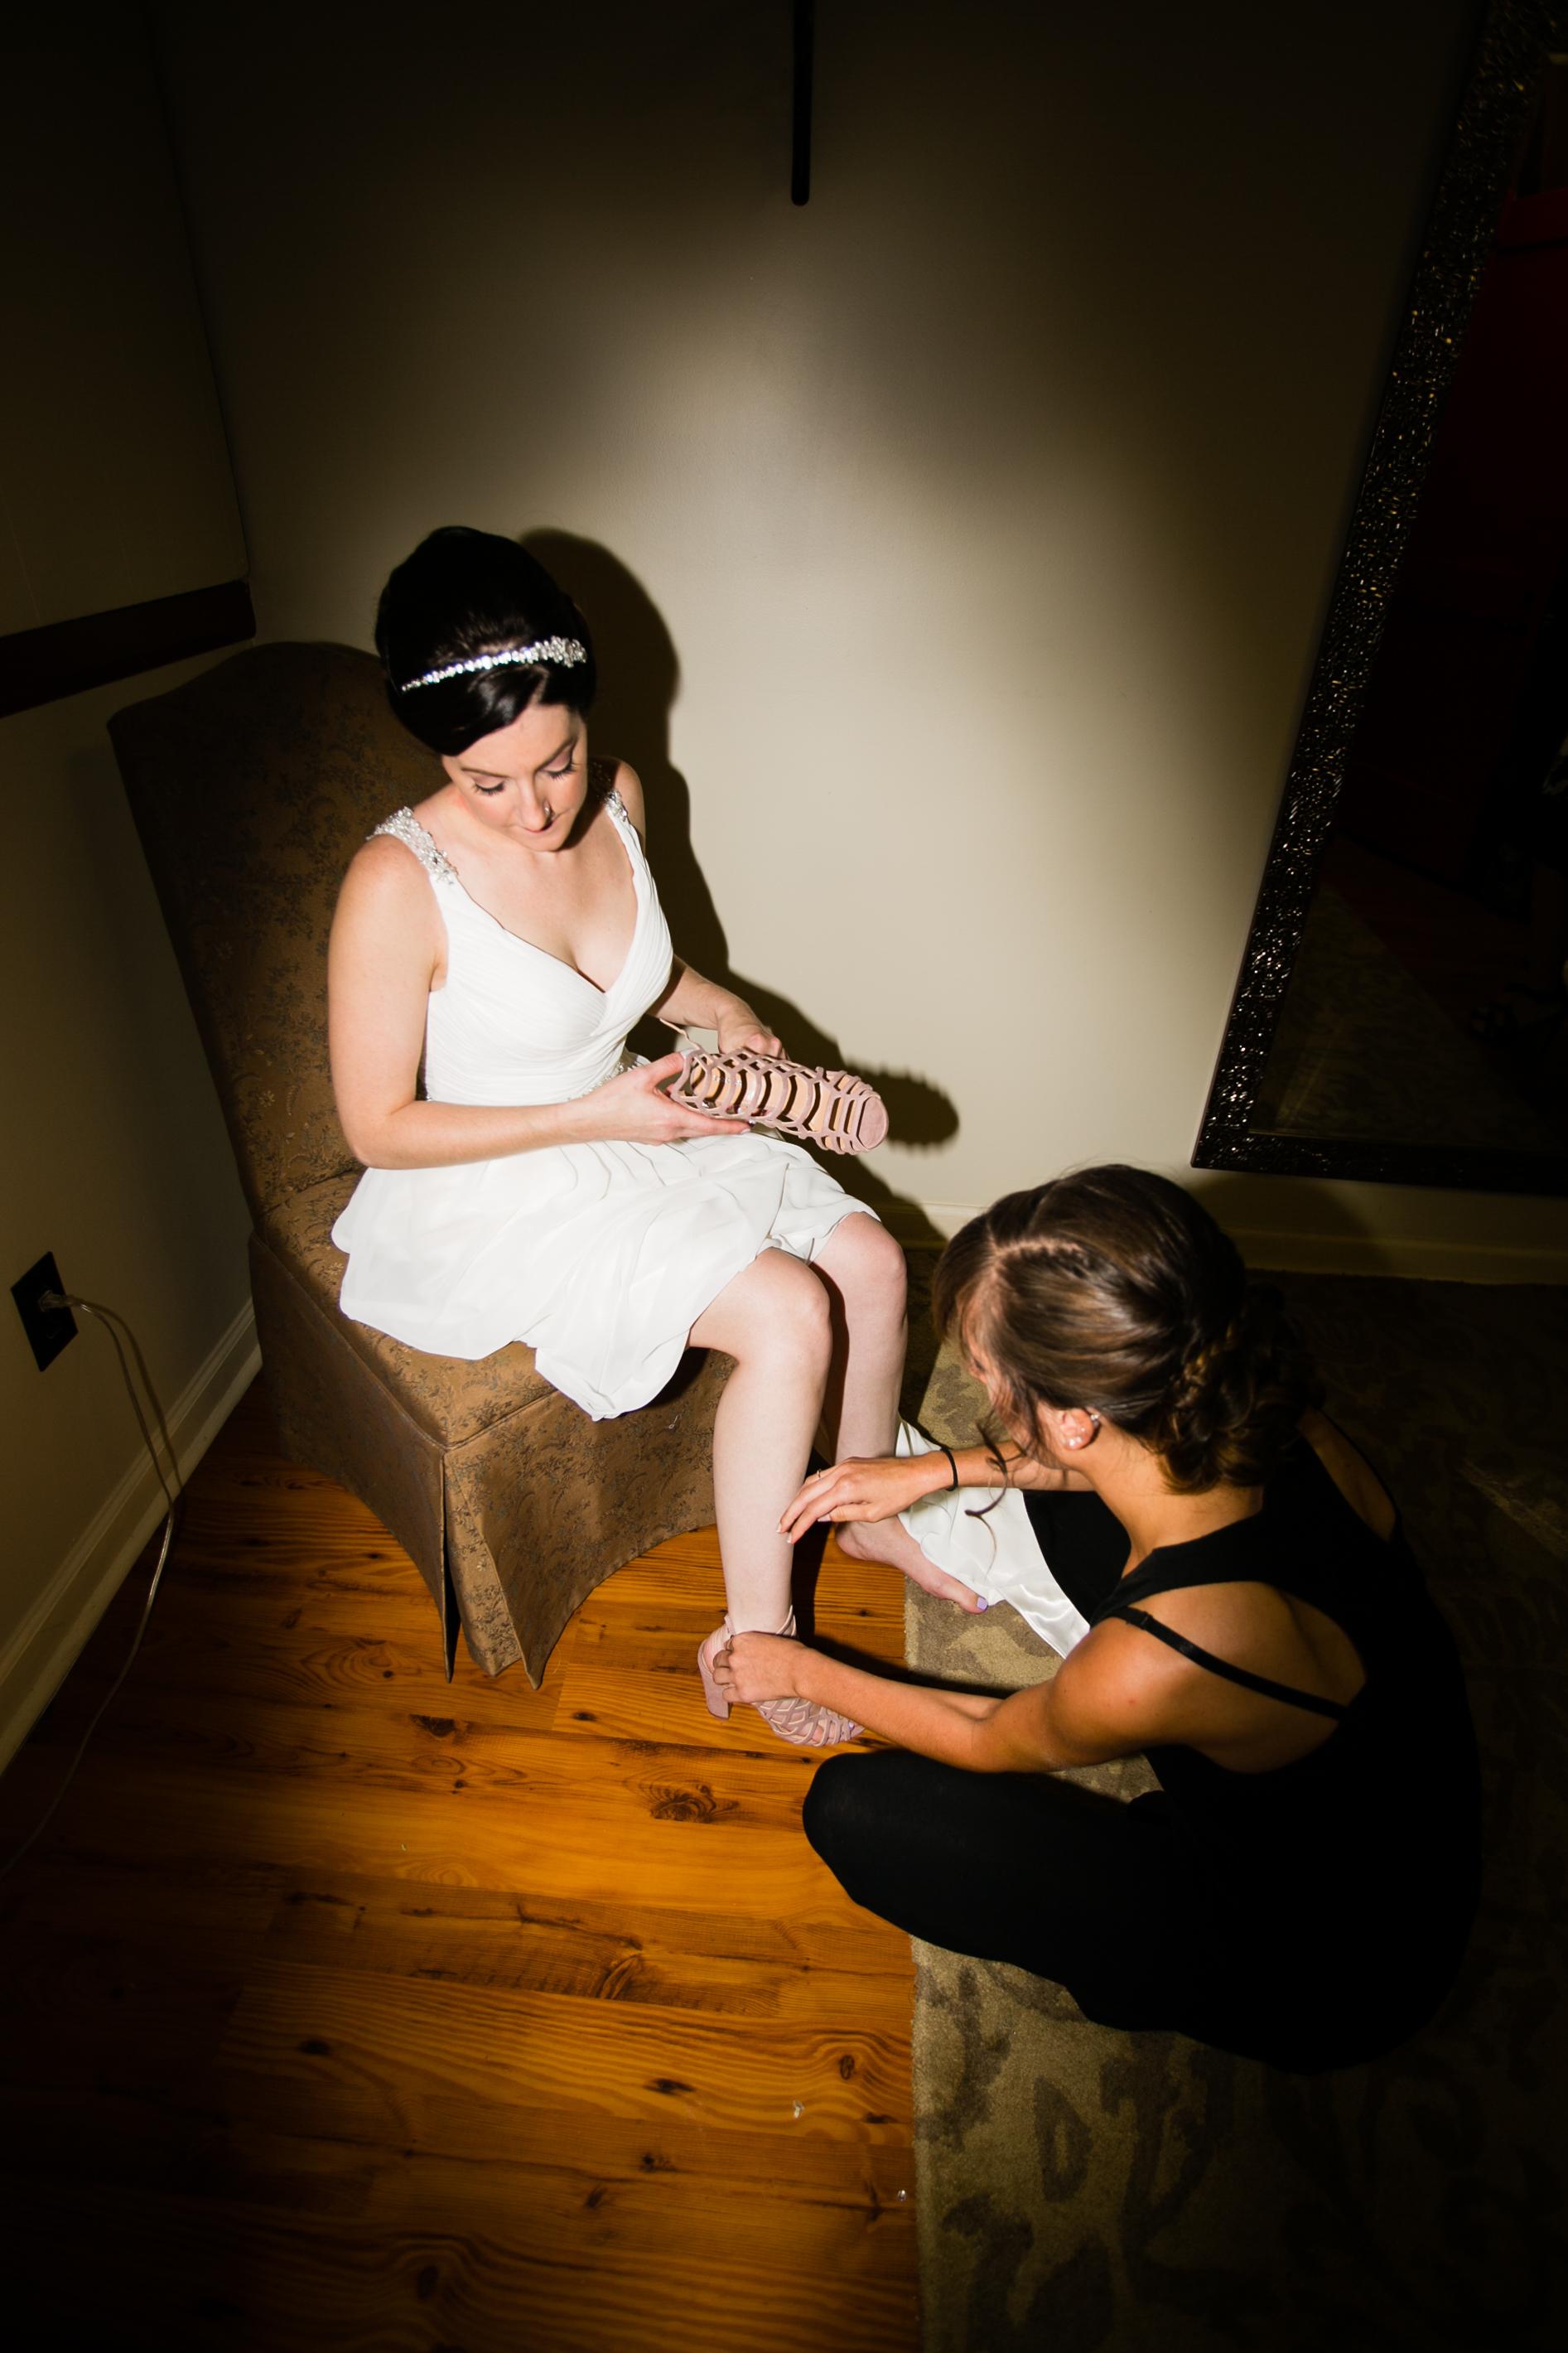 TYLER ARBORETUM WEDDING PHOTOGRAPHY LOVESTRUCK PICTURES-008.jpg